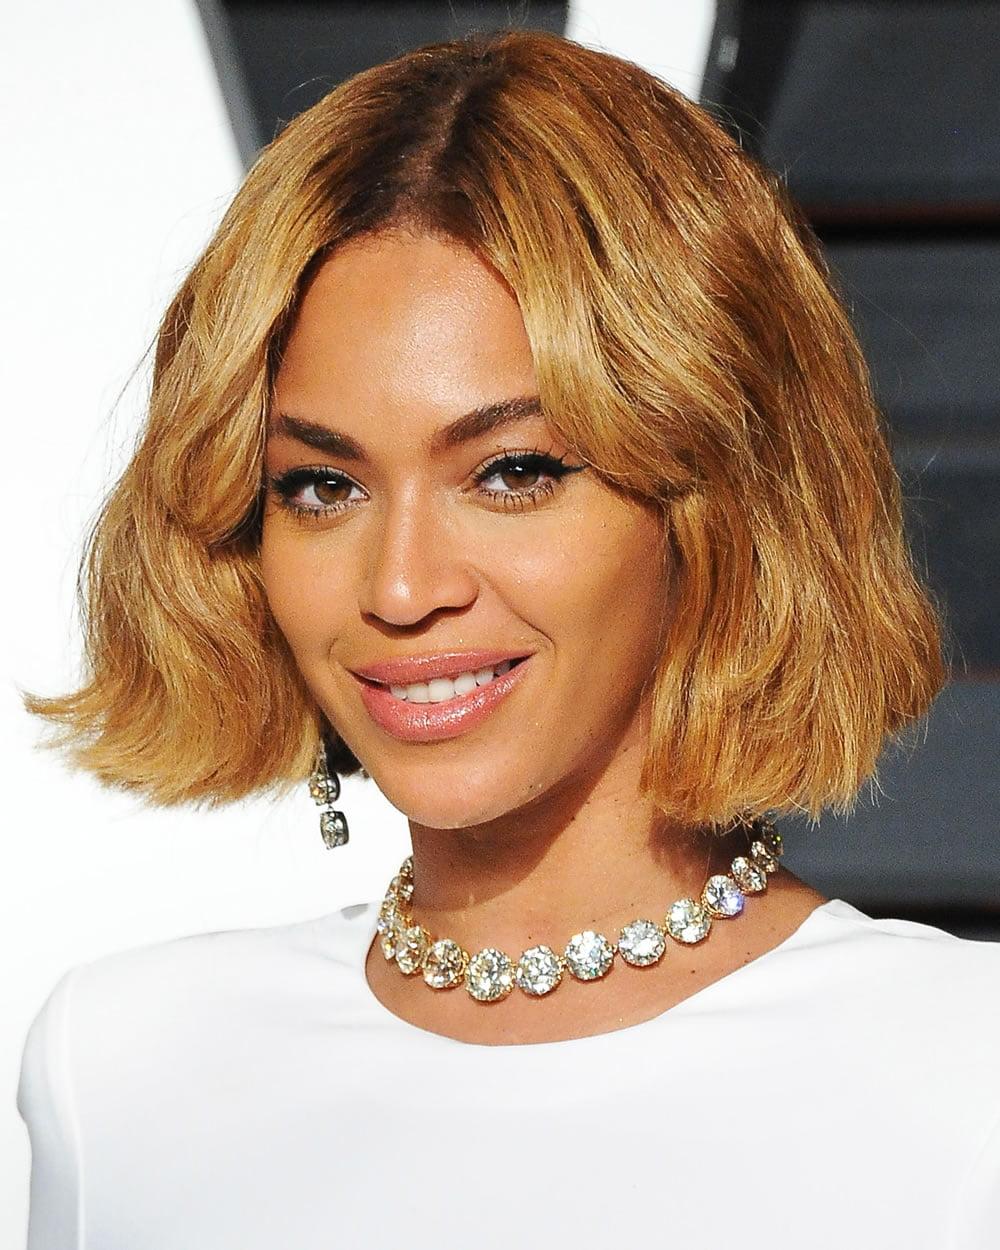 Short Bob Hair Cut for Women